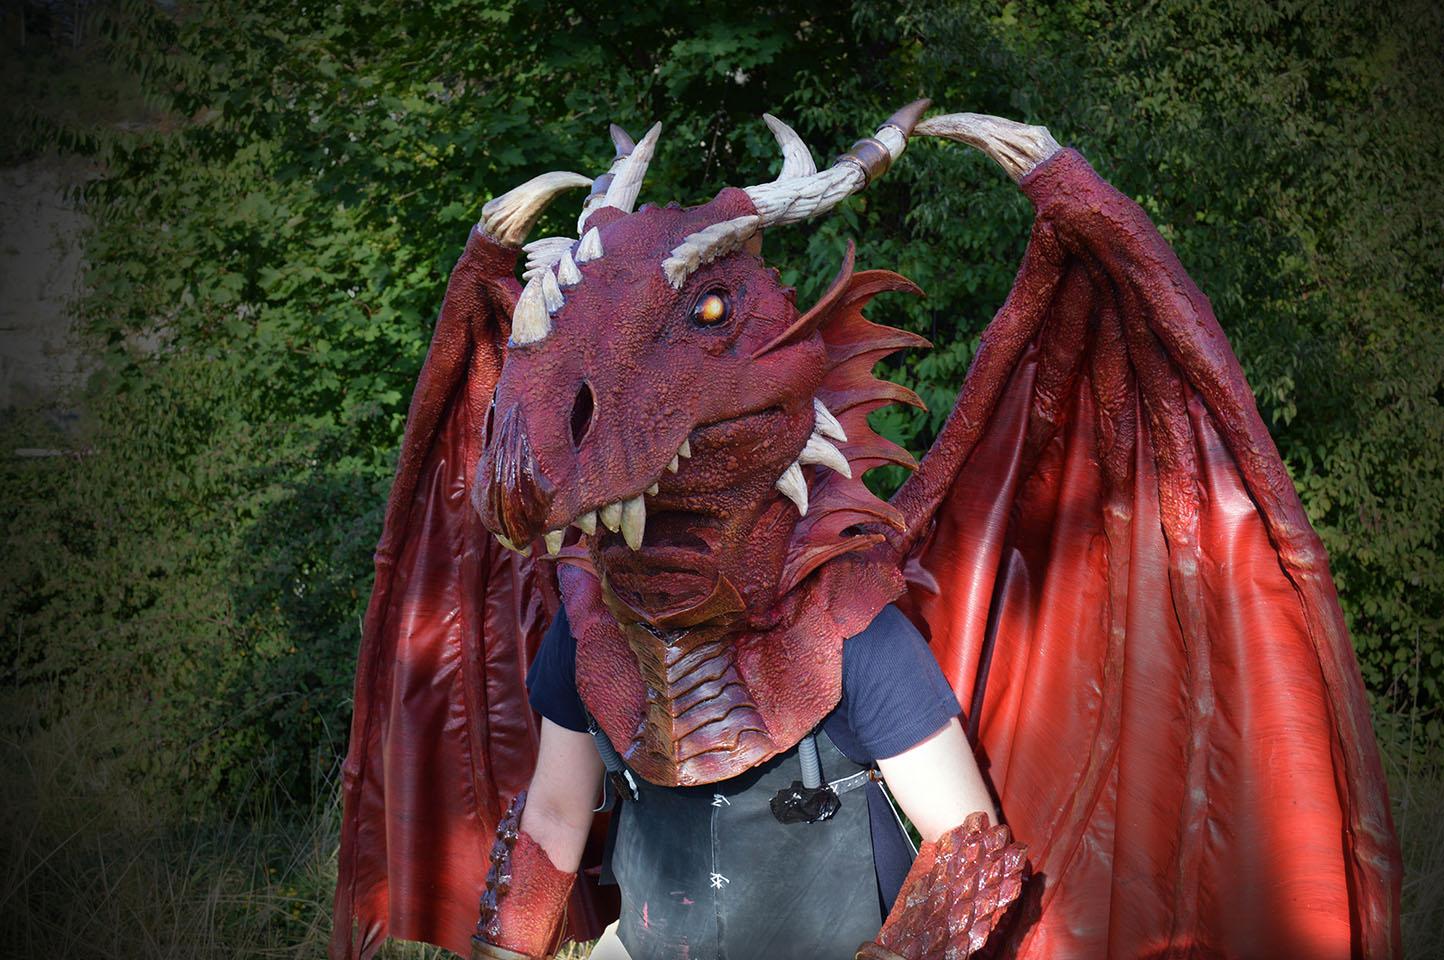 Dragon-Monstre-Costume-GN-LARP-Mad-Maker